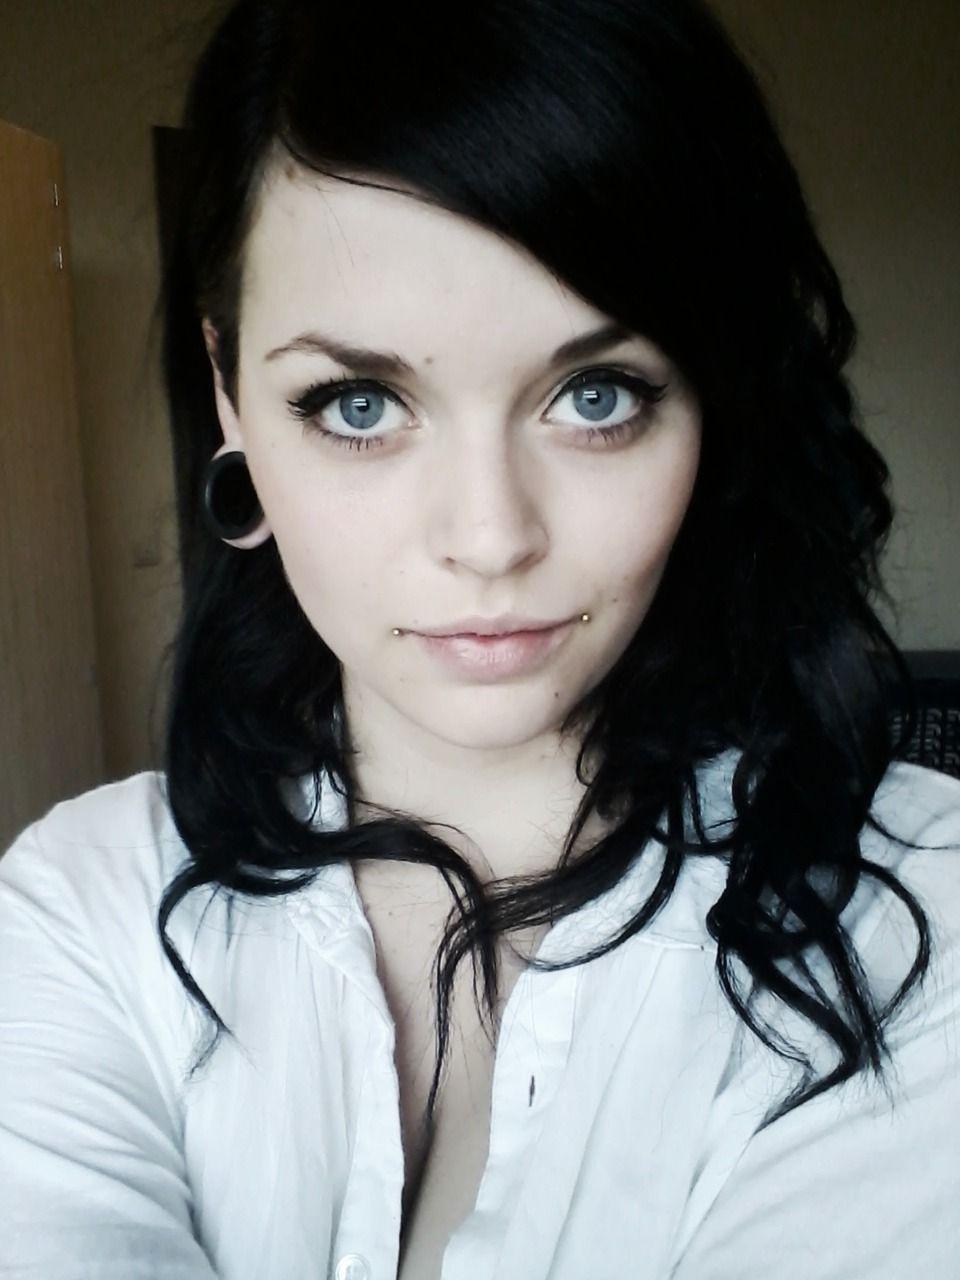 Love her dahlia bites Omg! she's so pretty :c